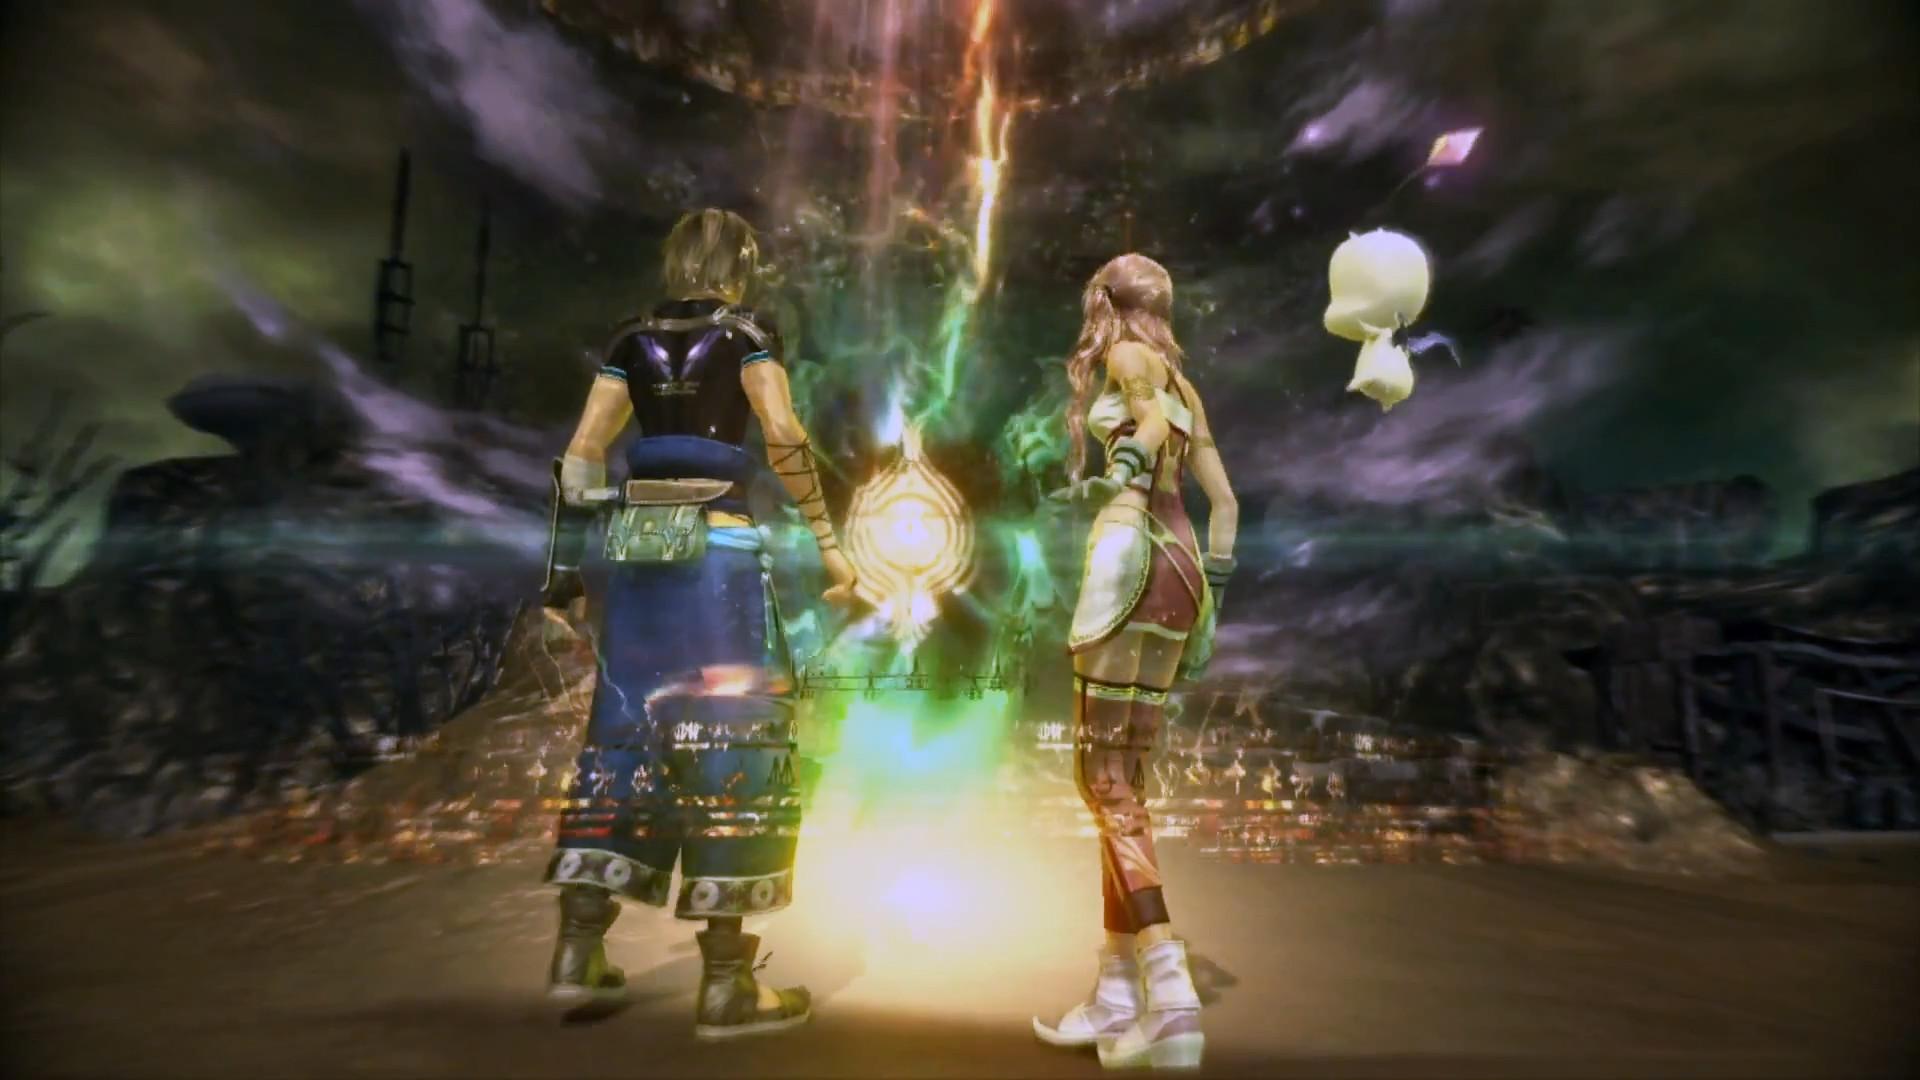 Final Fantasy XIII 2 Wallpaper (88+ images)